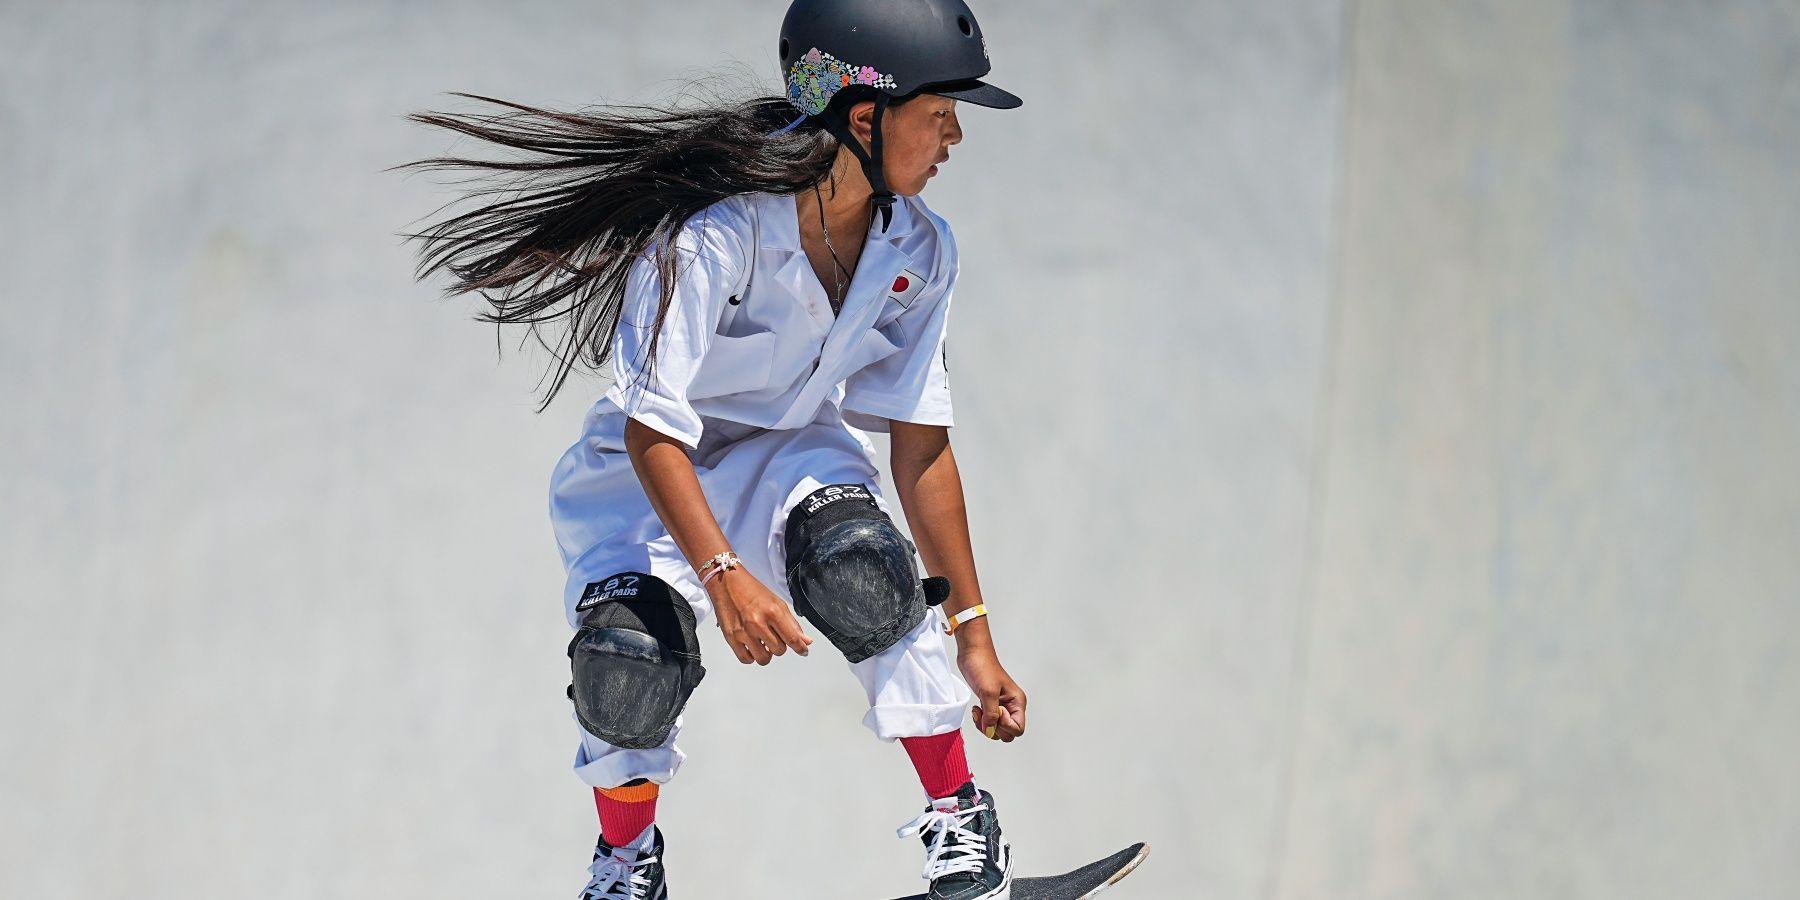 Kokona Hiraki during women's park skateboard at the Olympics at Ariake Urban Park, Tokyo, Japan on August 4, 2021. (Photo by Ulrik Pedersen/NurPhoto via Getty Images)